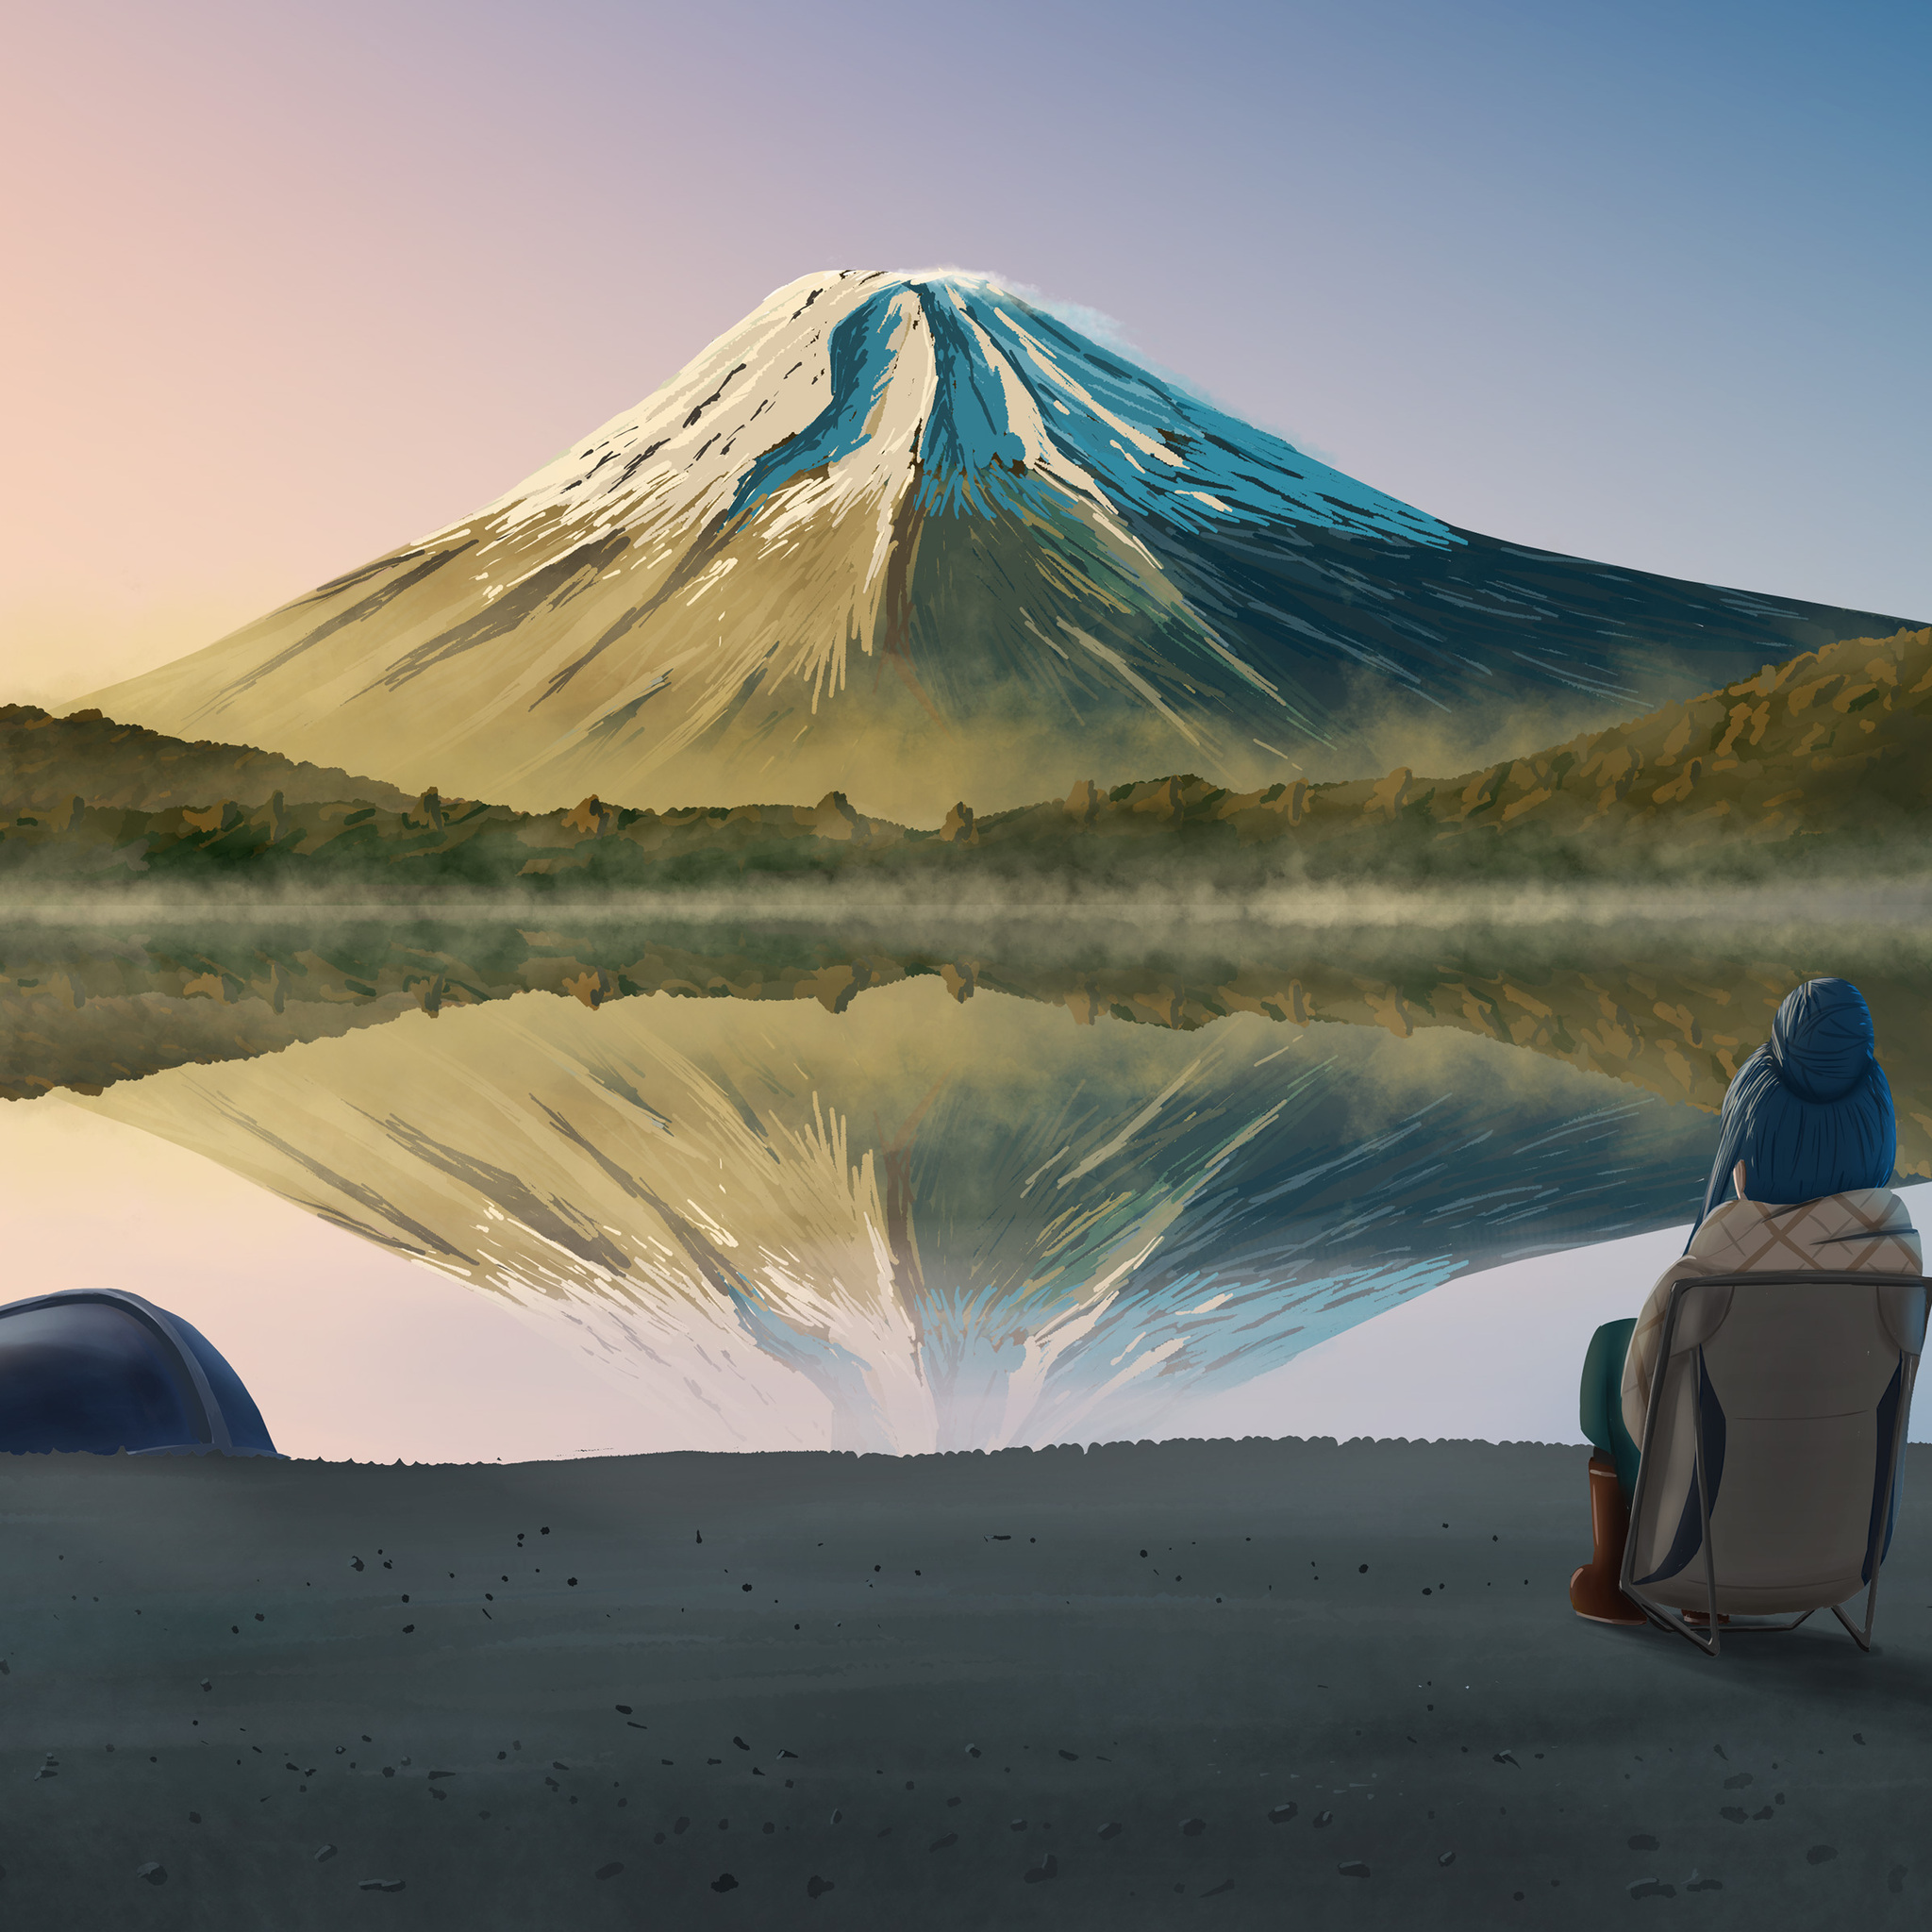 2048x2048 Laid Back Camp Nadeshiko Kagamihara Rin Shima Ipad Air Hd 4k Wallpapers Images Backgrounds Photos And Pictures